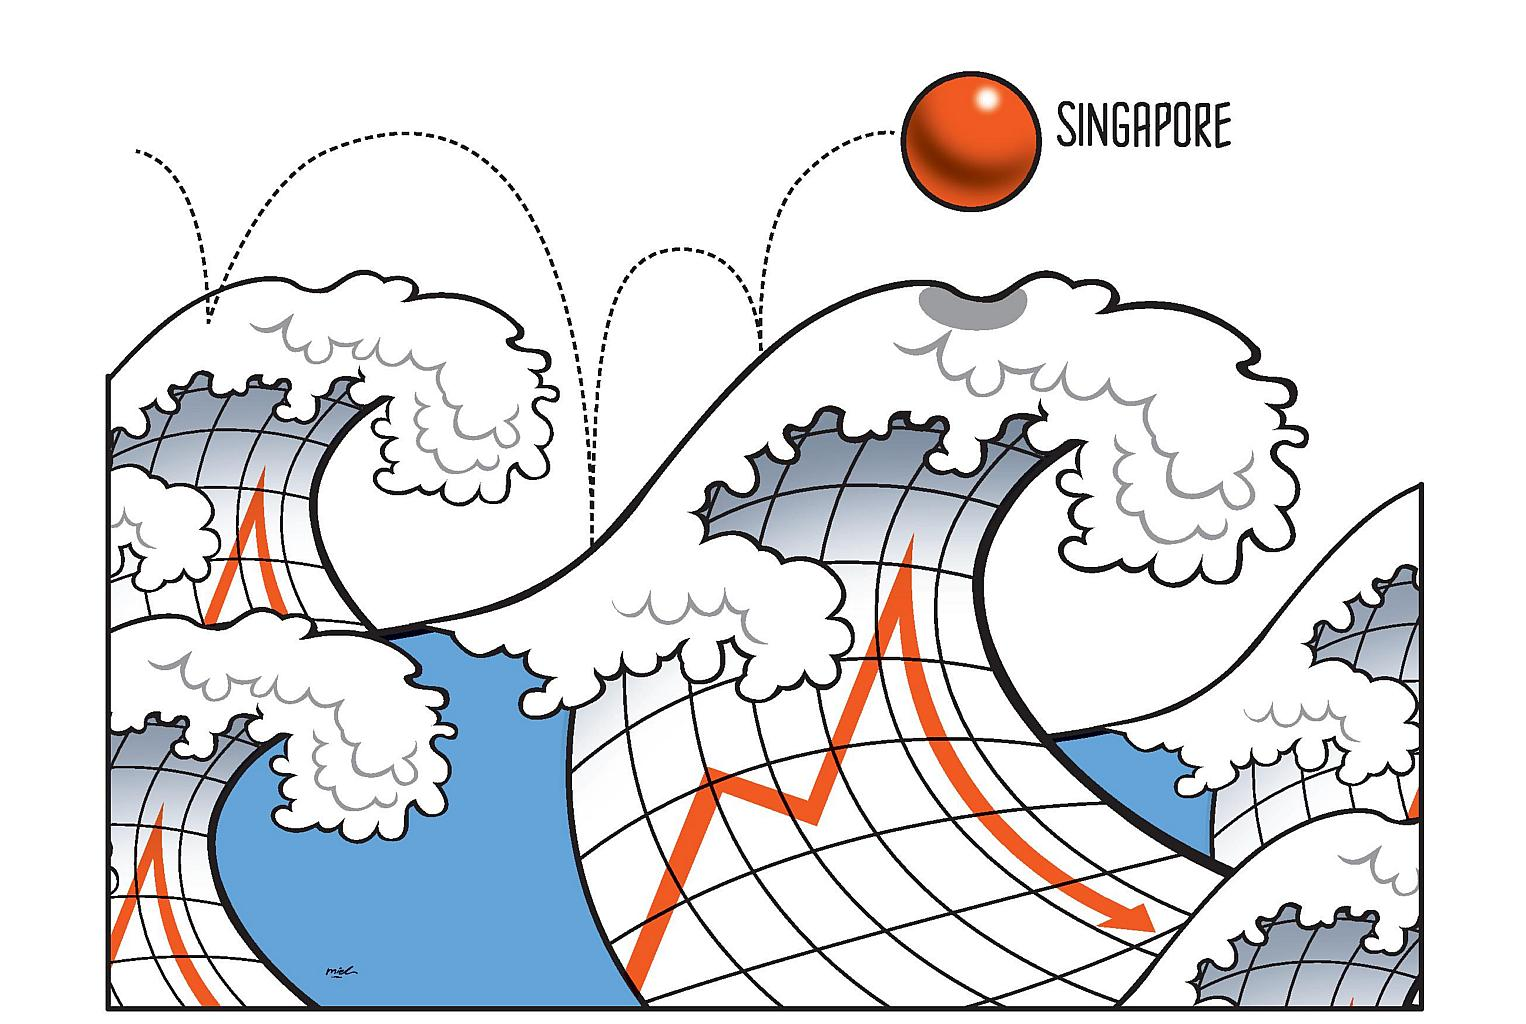 political environment of singapore